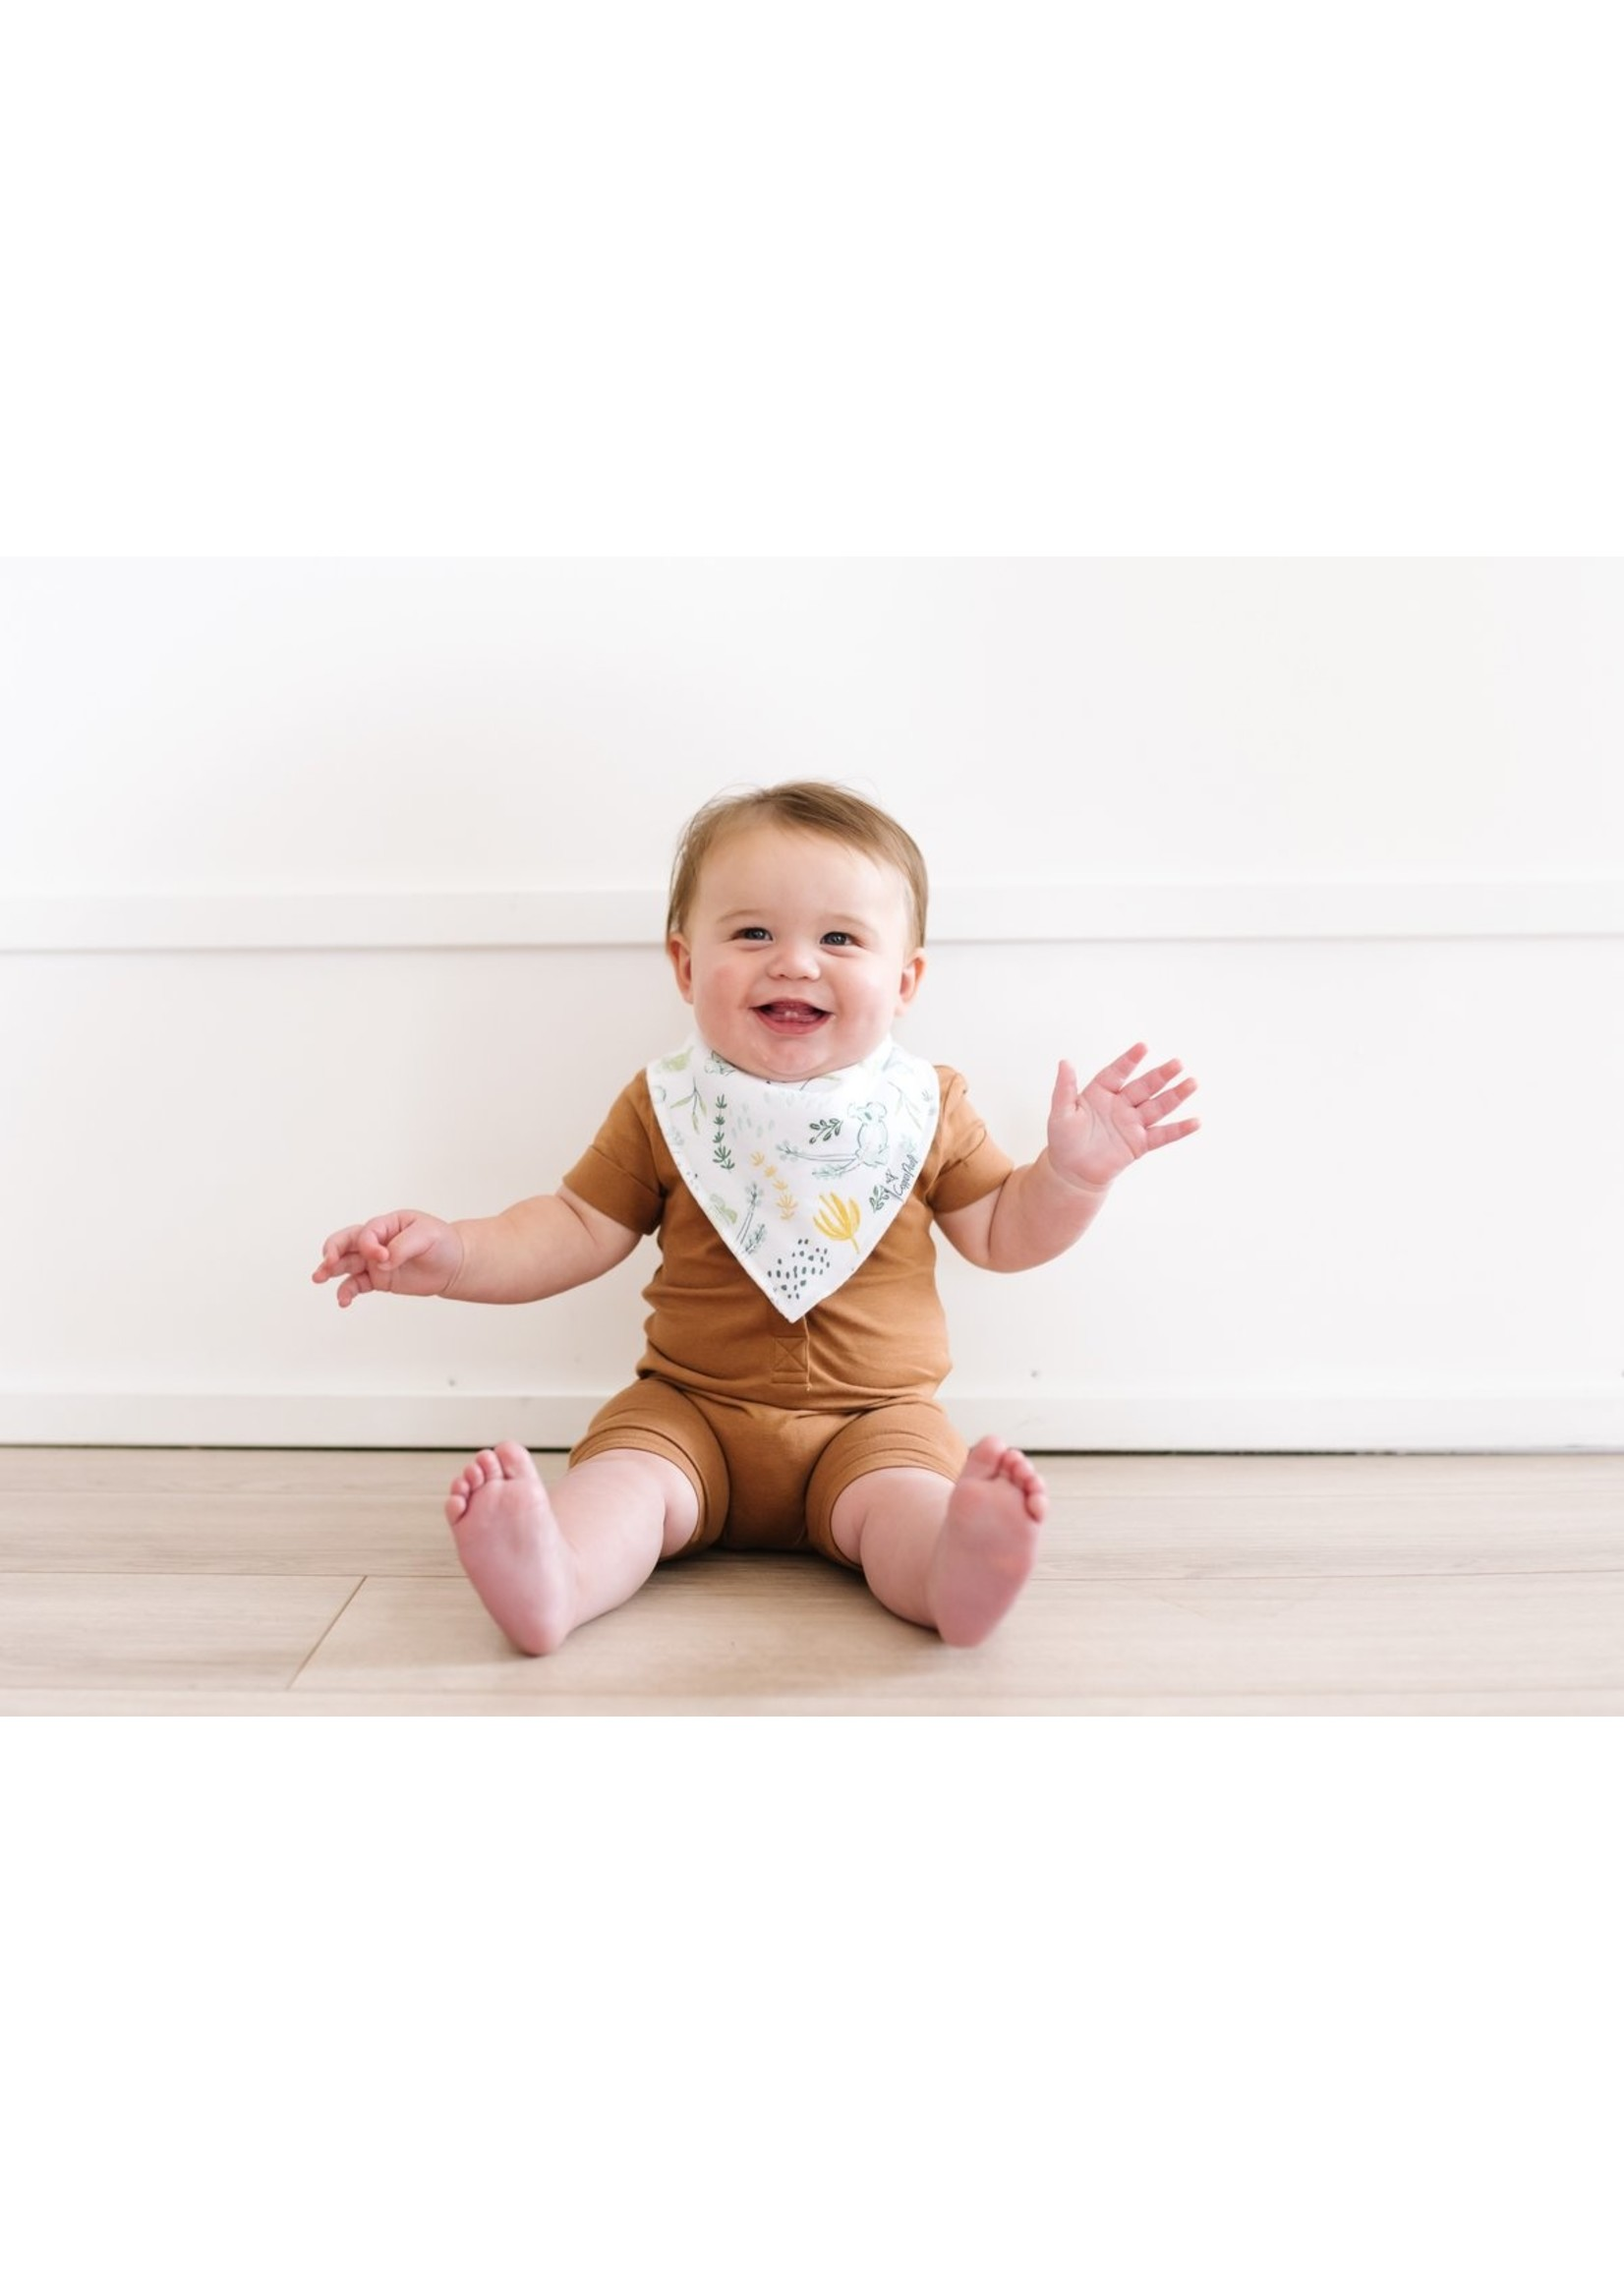 Copper pearl Baby Bandana Bibs - Aussie